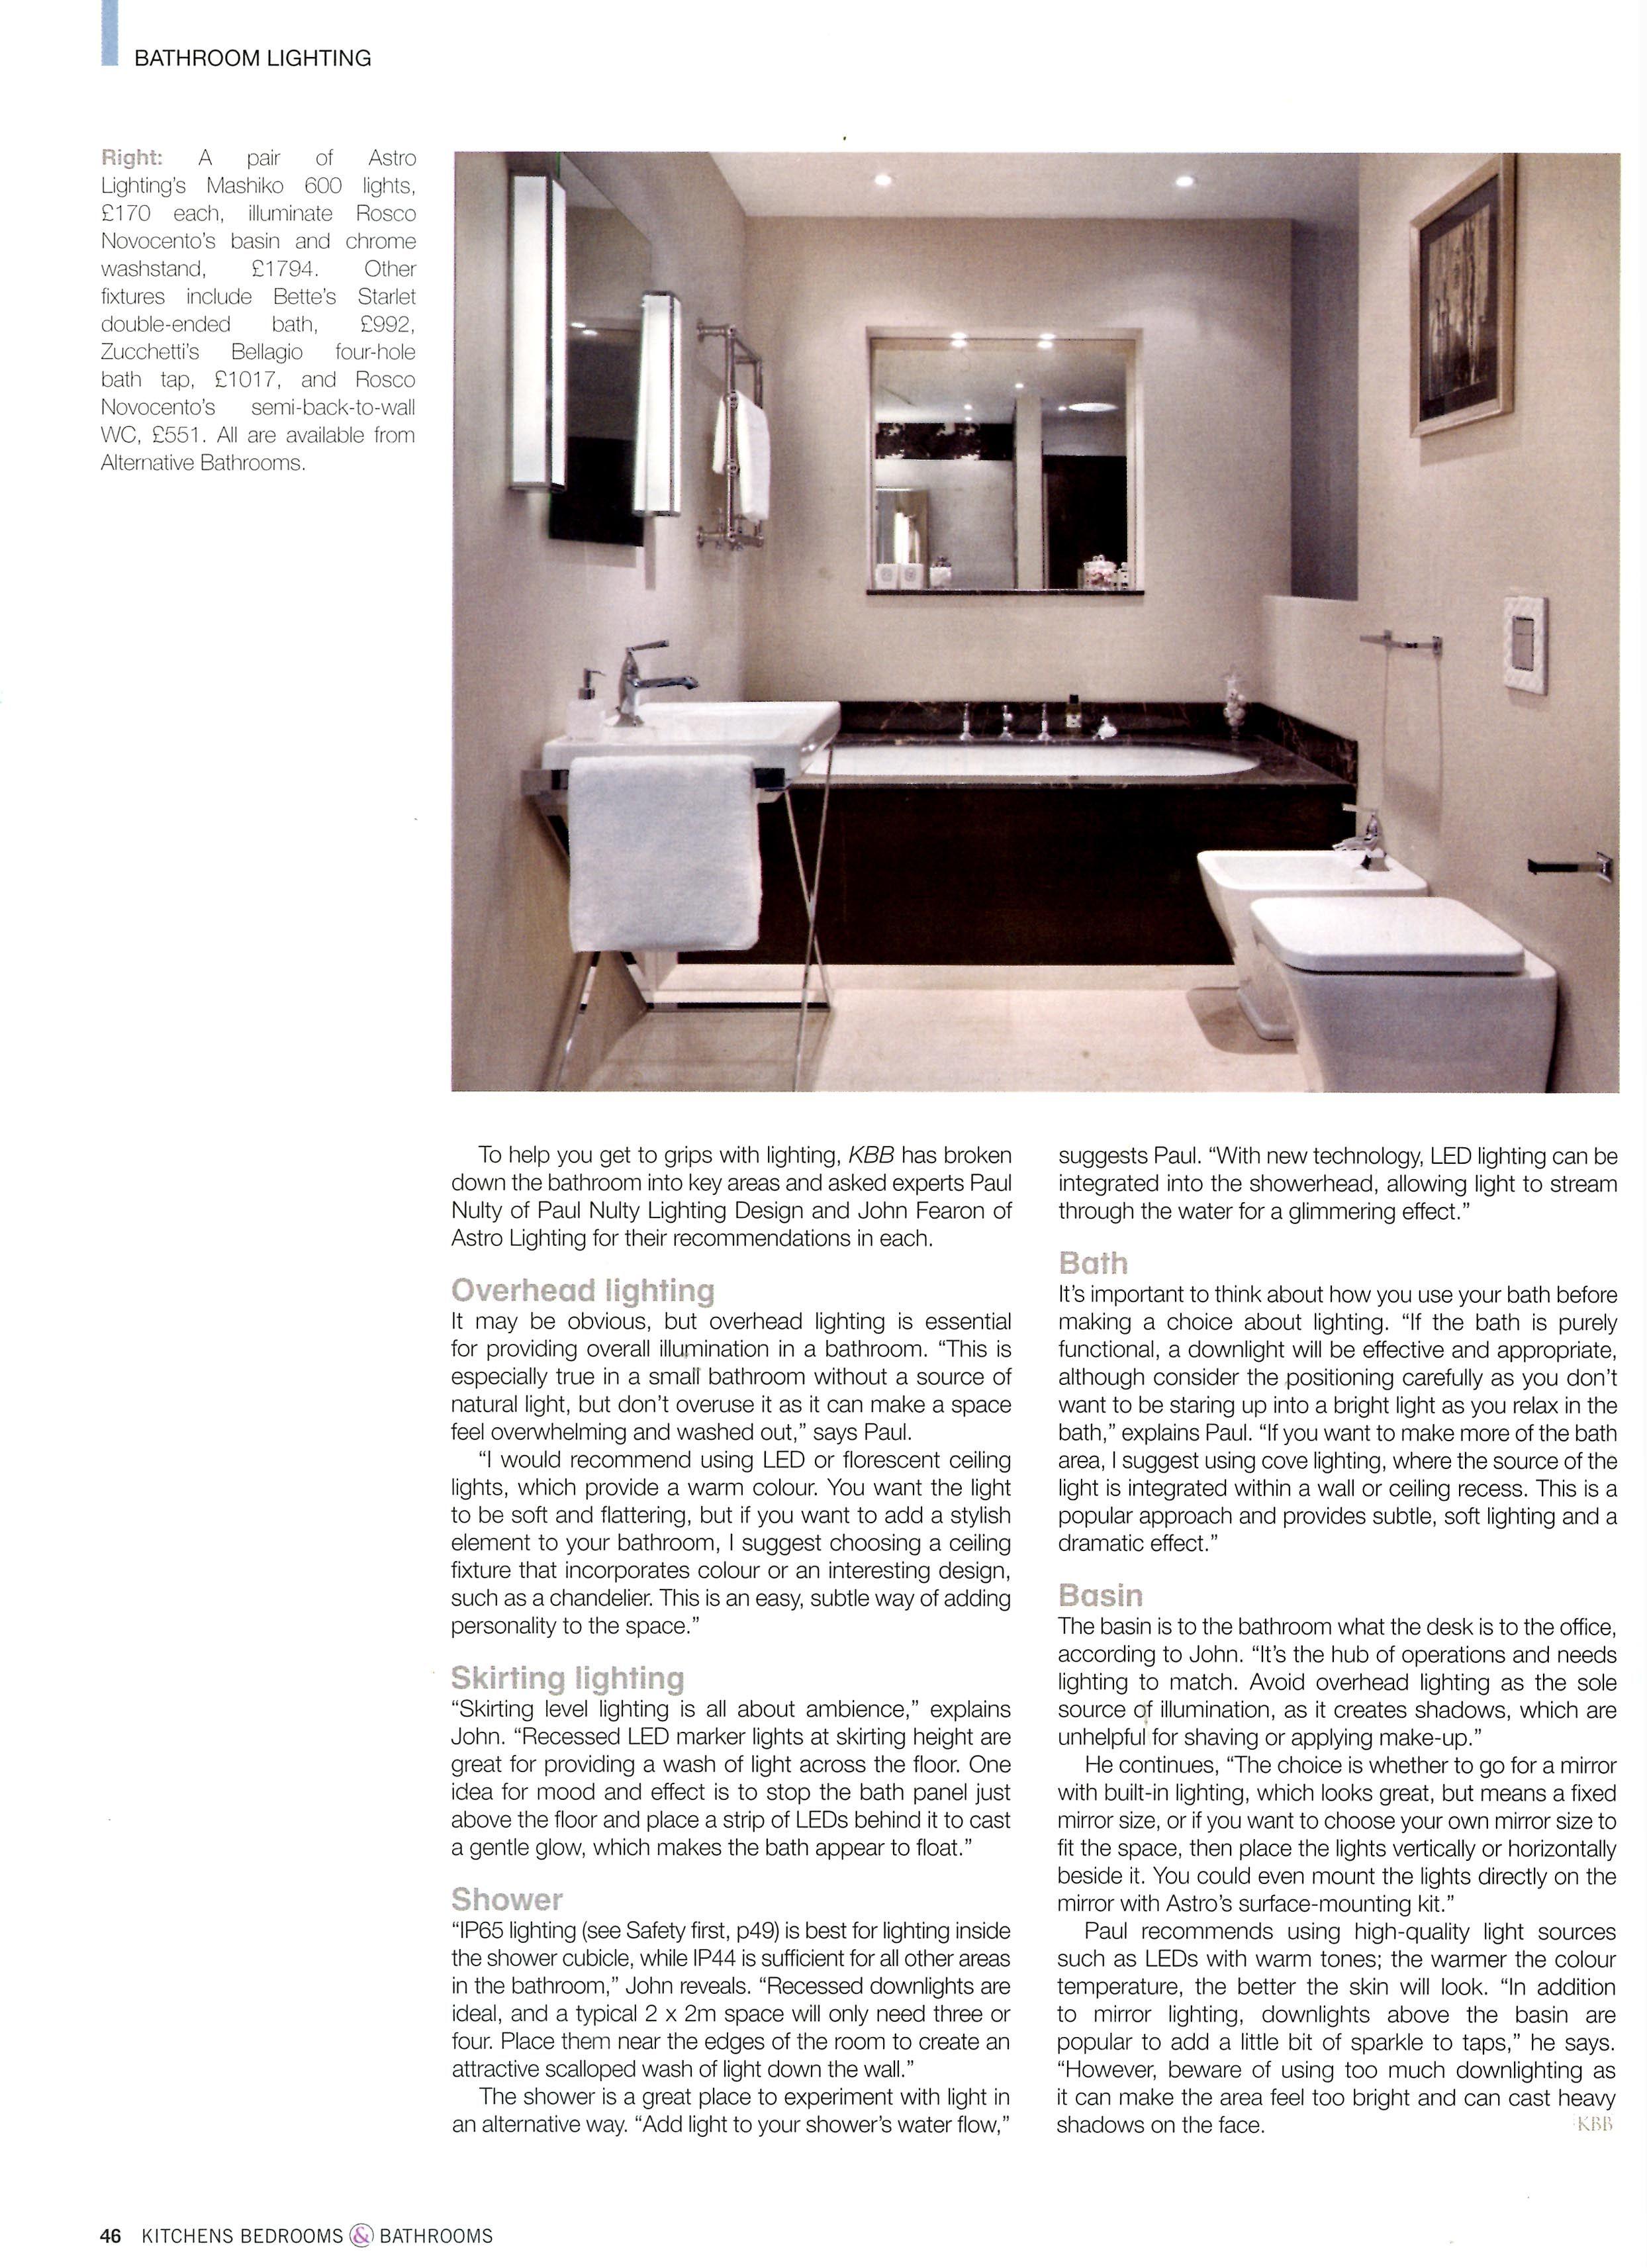 Bathroom lighting advice featuring a pair of astro lightings bathroom lighting advice featuring a pair of astro lightings mashiko 600 lights rosco novocentos aloadofball Choice Image